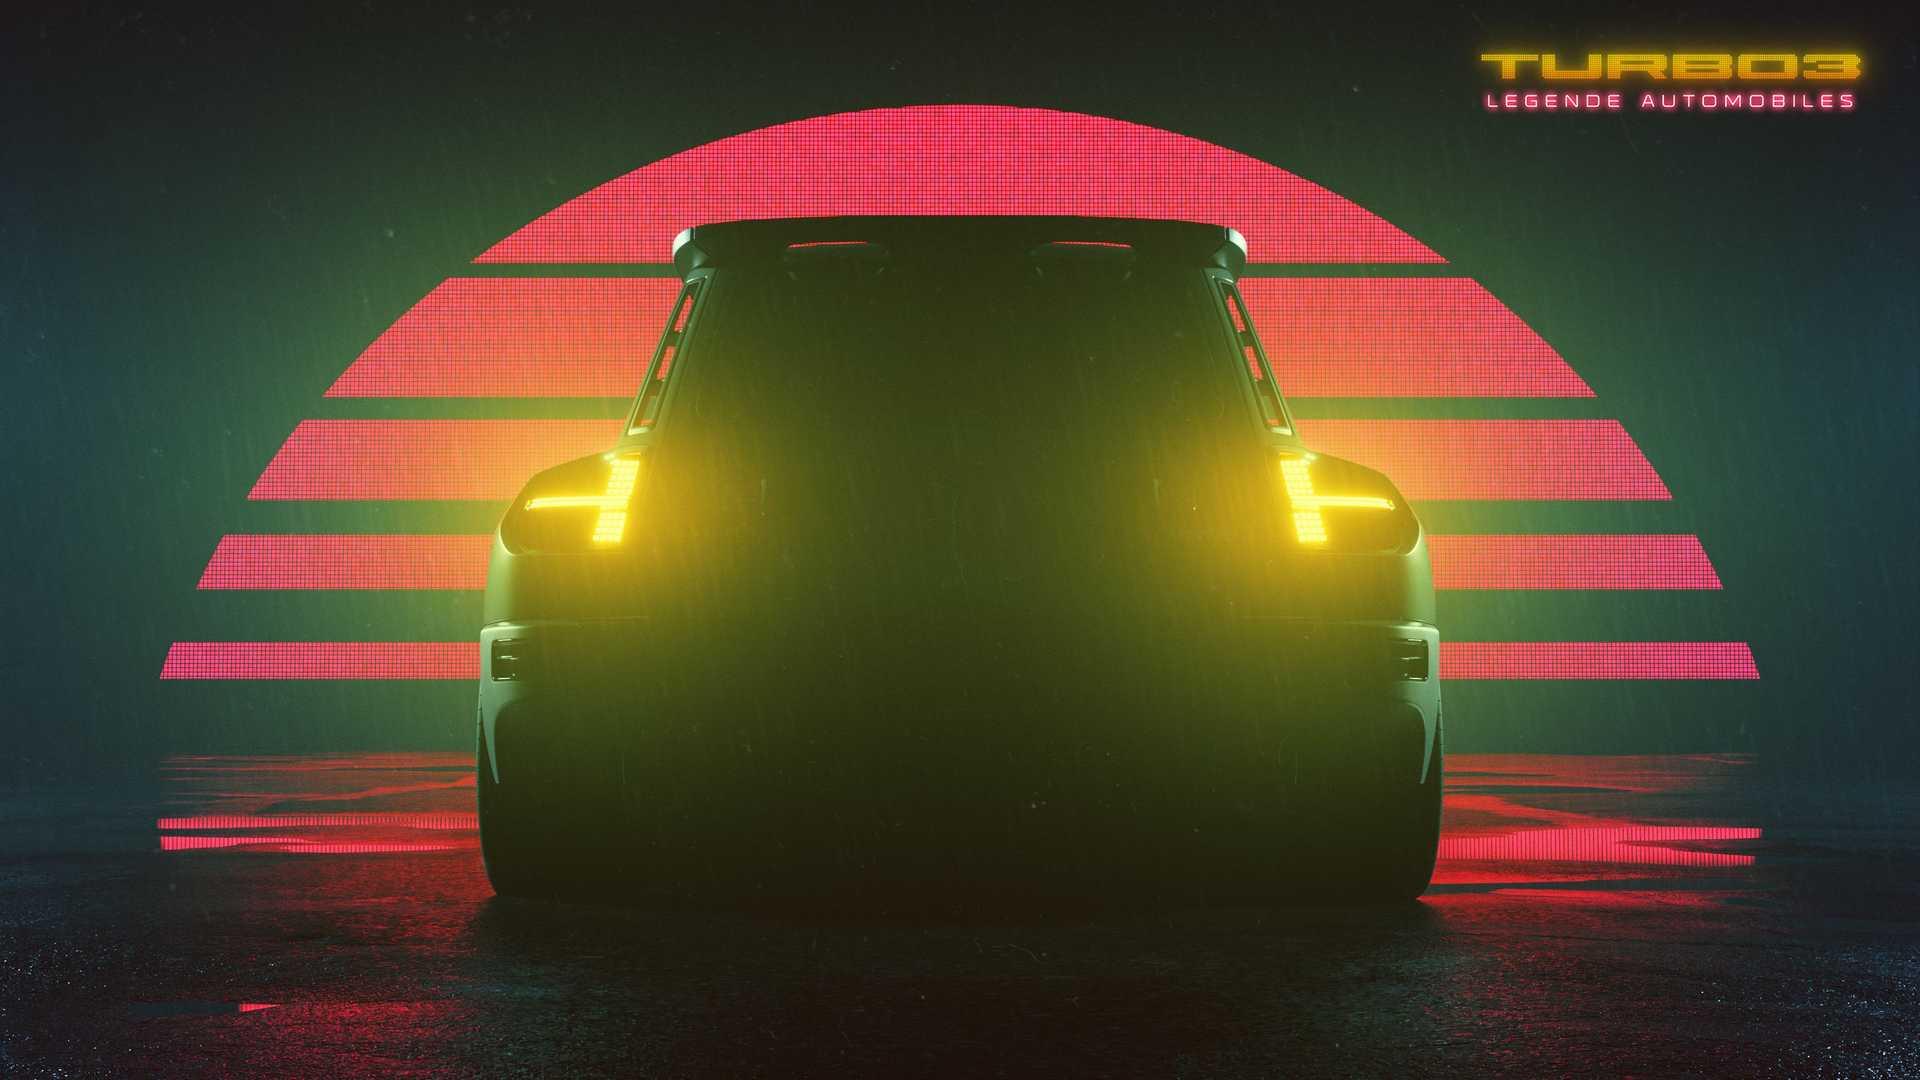 Legend Automobiles Turbo3